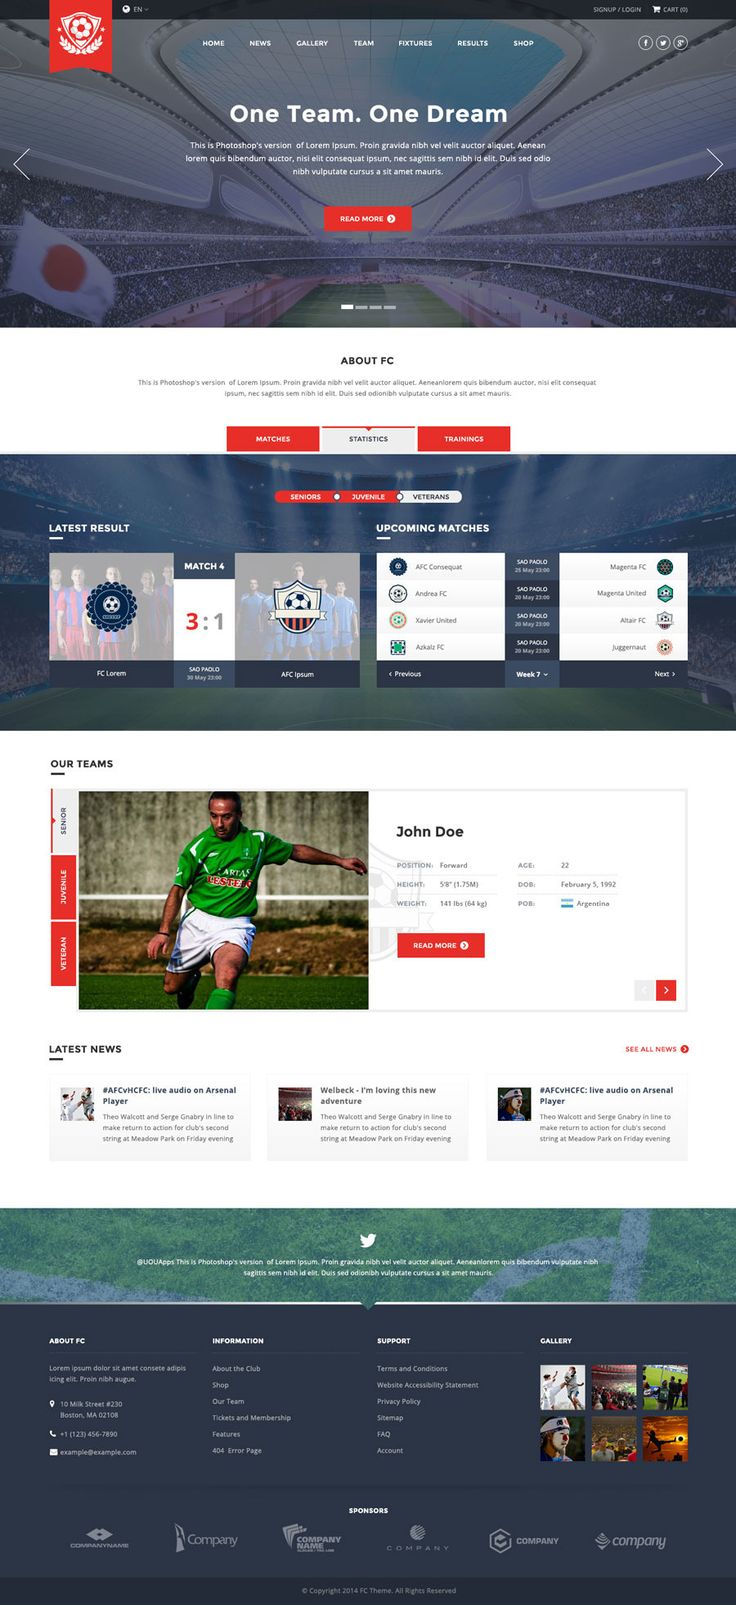 FC - Football Club Template (Soccer HTML) #site #team #soccer • Download ➝ https://themeforest.net/item/fc-football-club-template-soccer-html/10638733?ref=pxcr